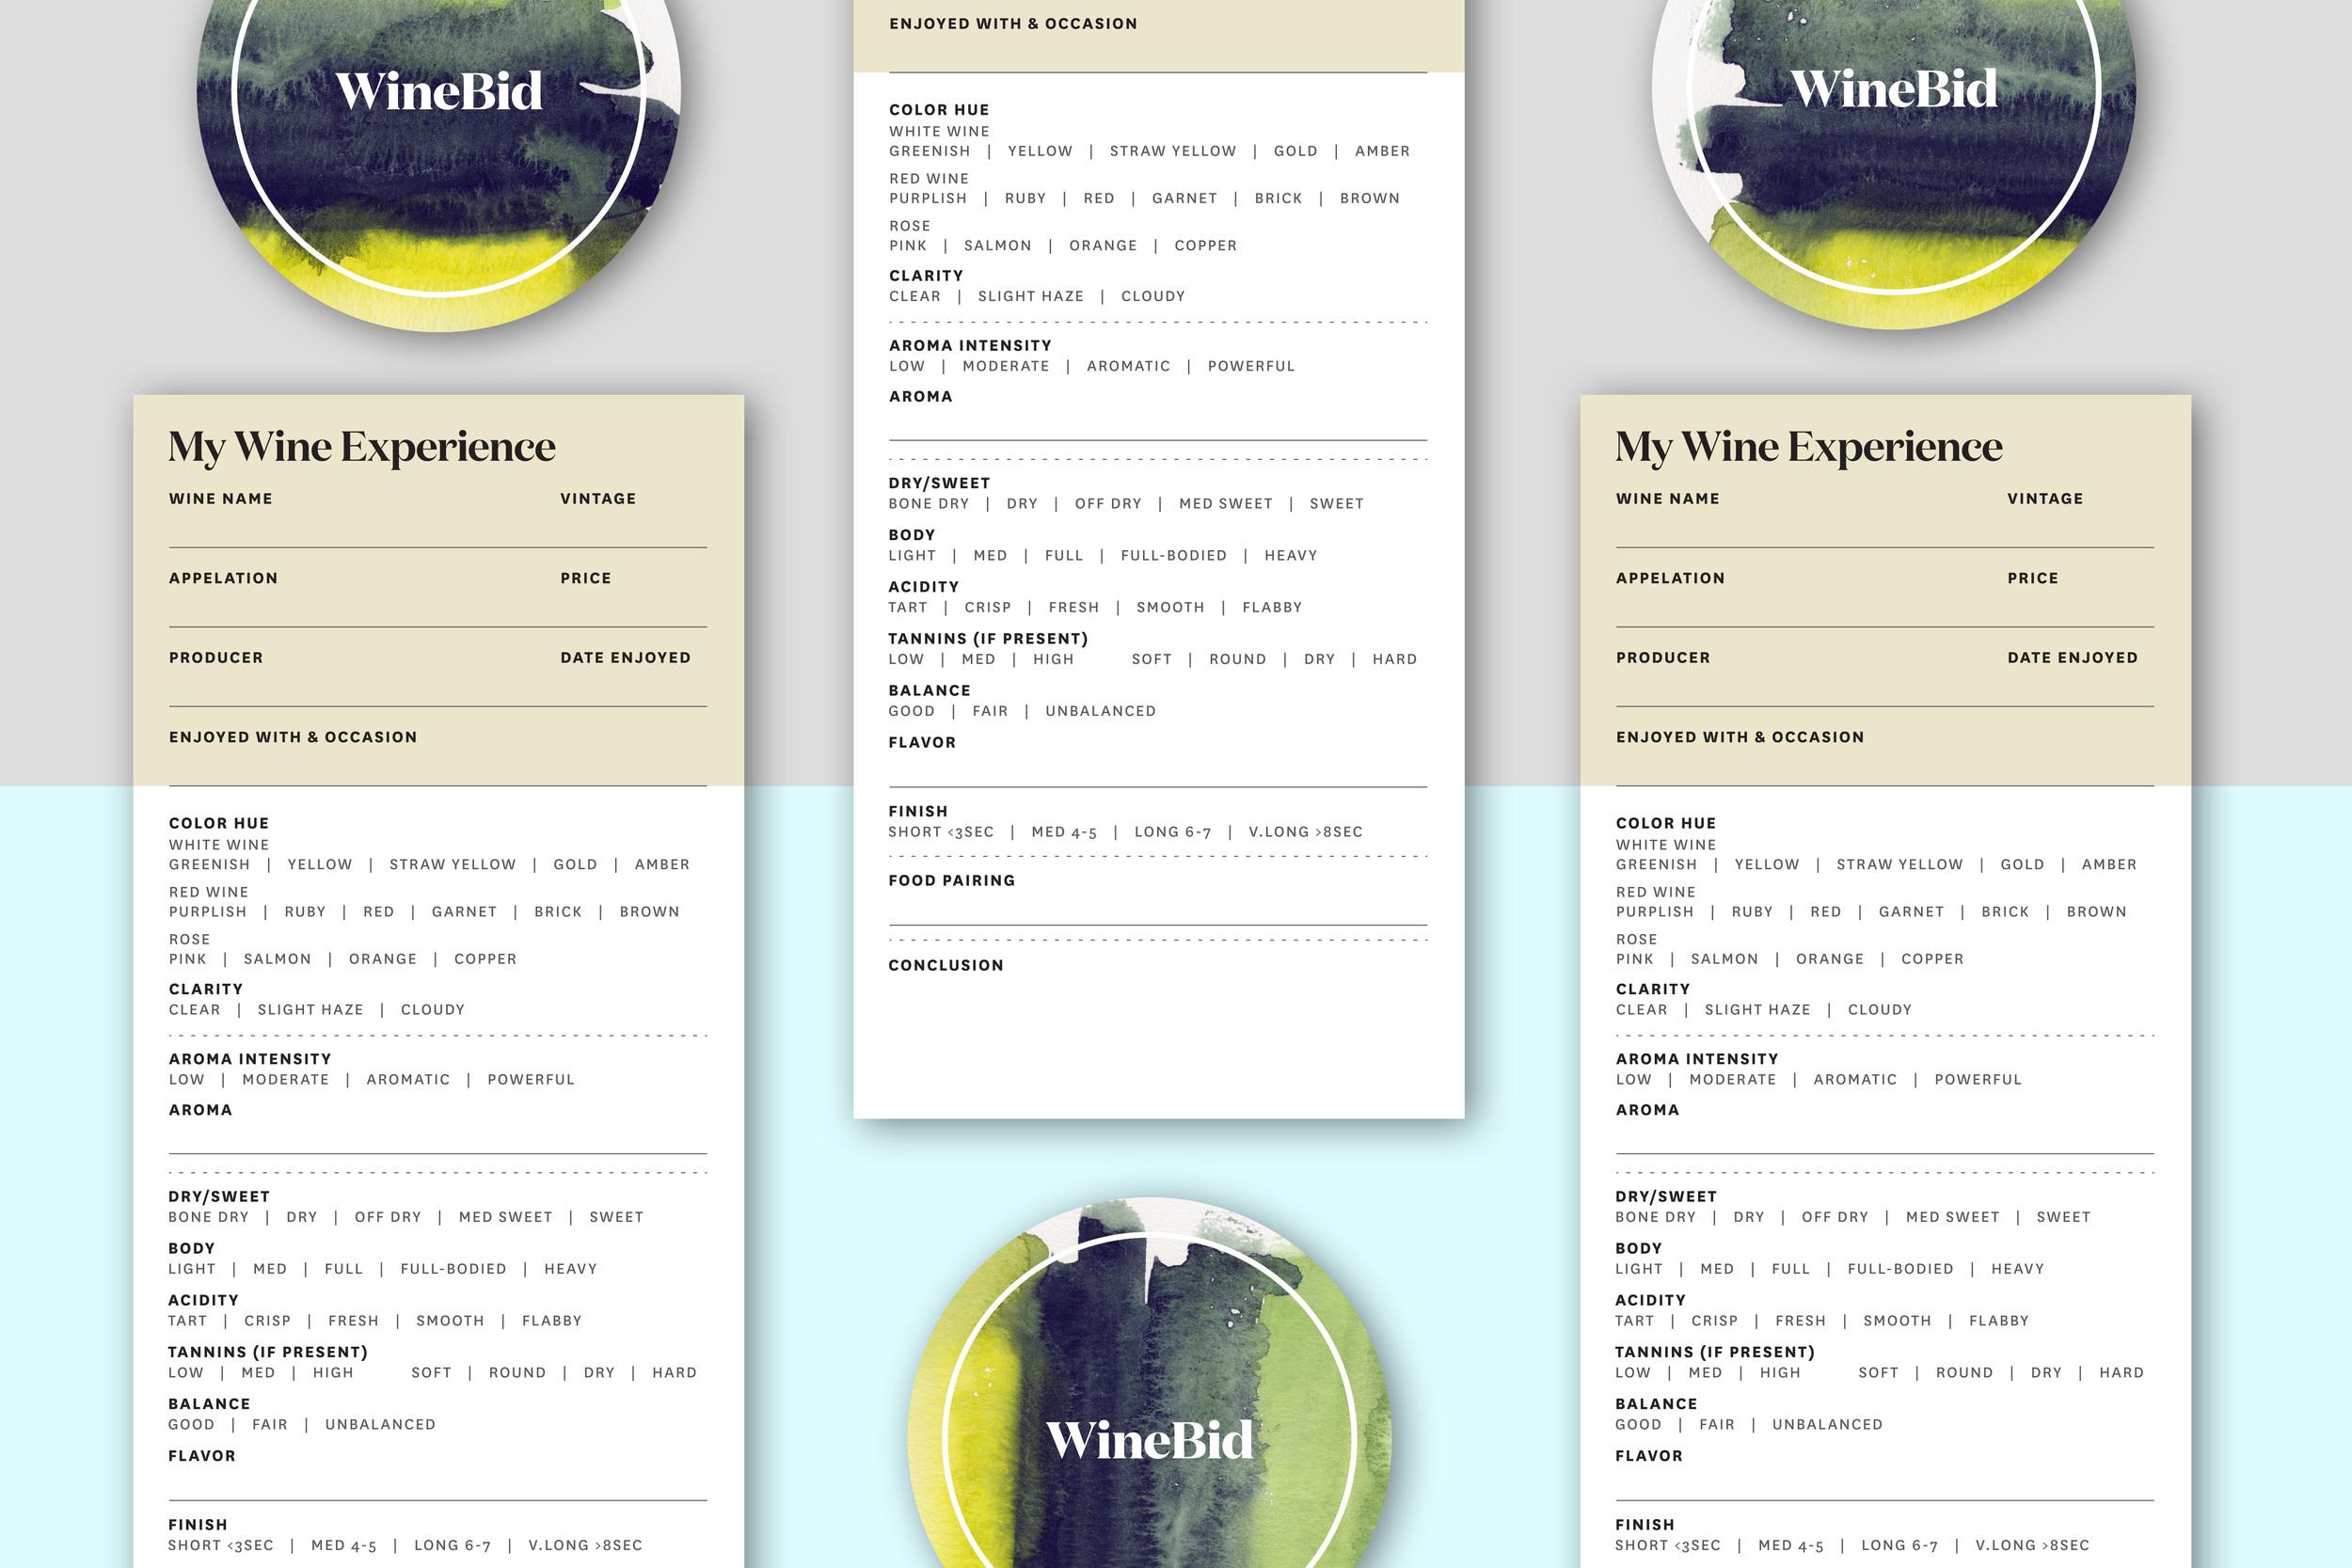 WineBid Wine Score and Coaster